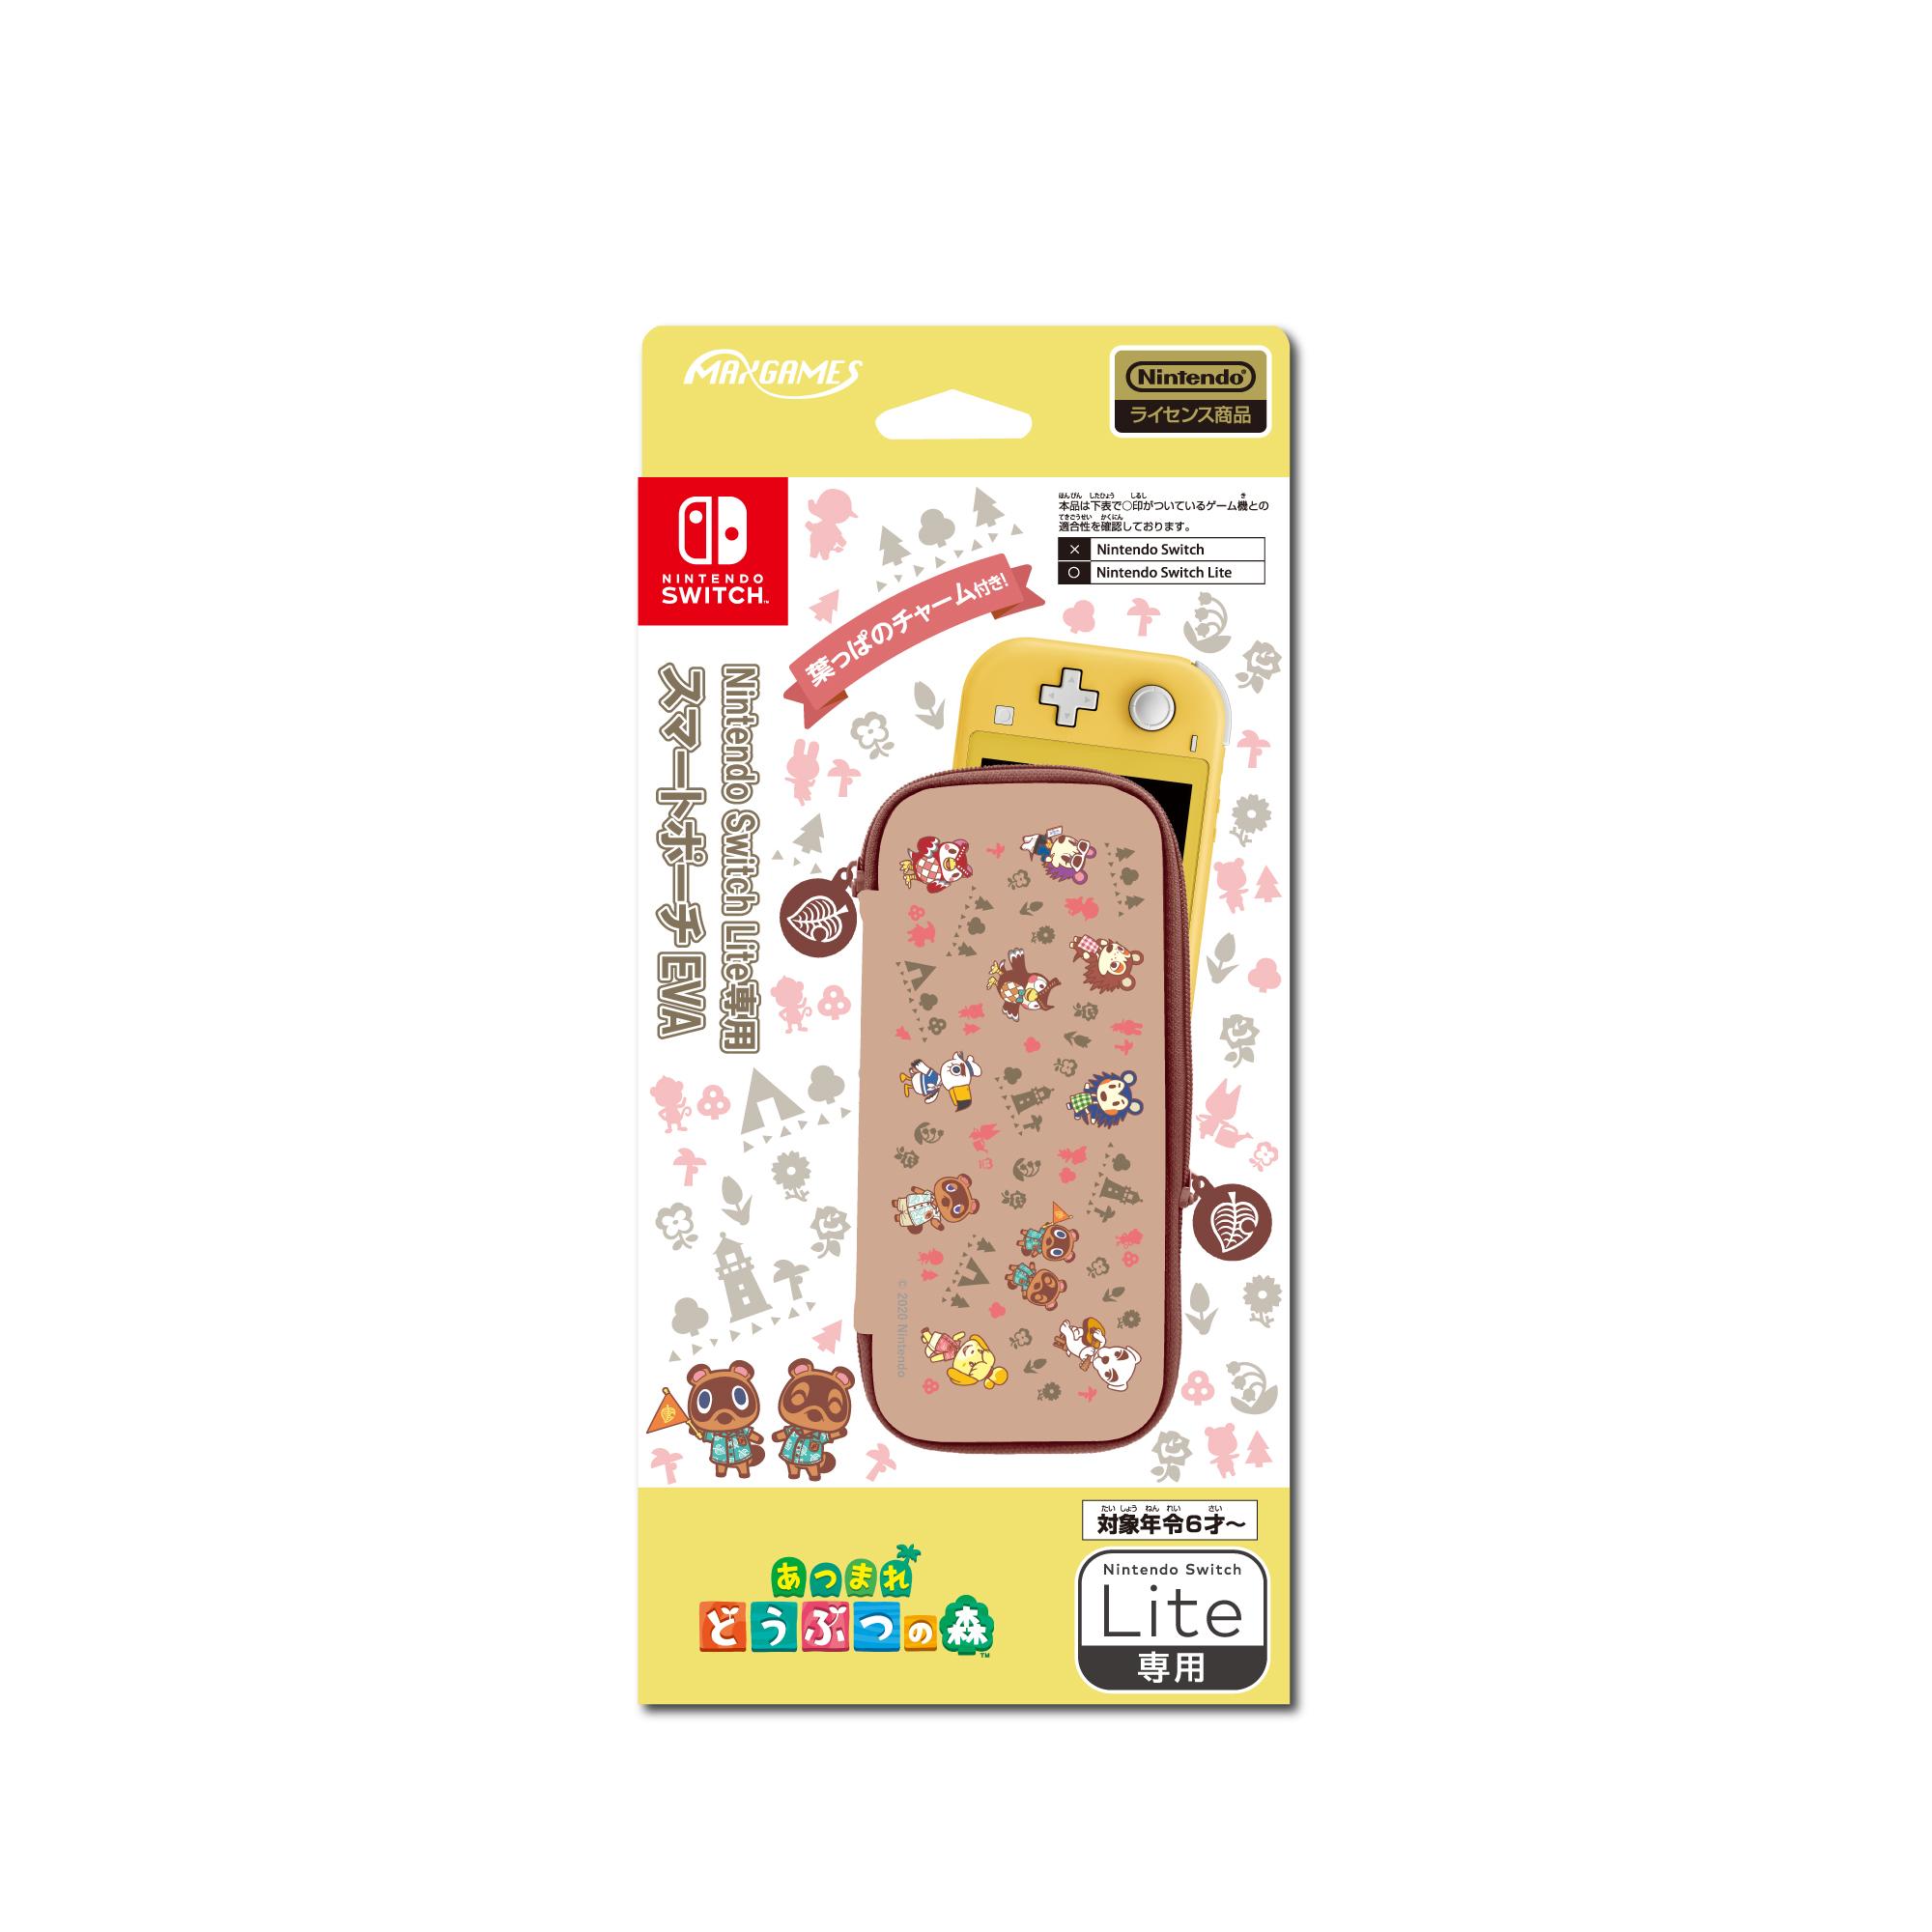 Nintendo Switch Lite専用<br>スマートポーチEVA<br>あつまれ どうぶつの森 ラインアート